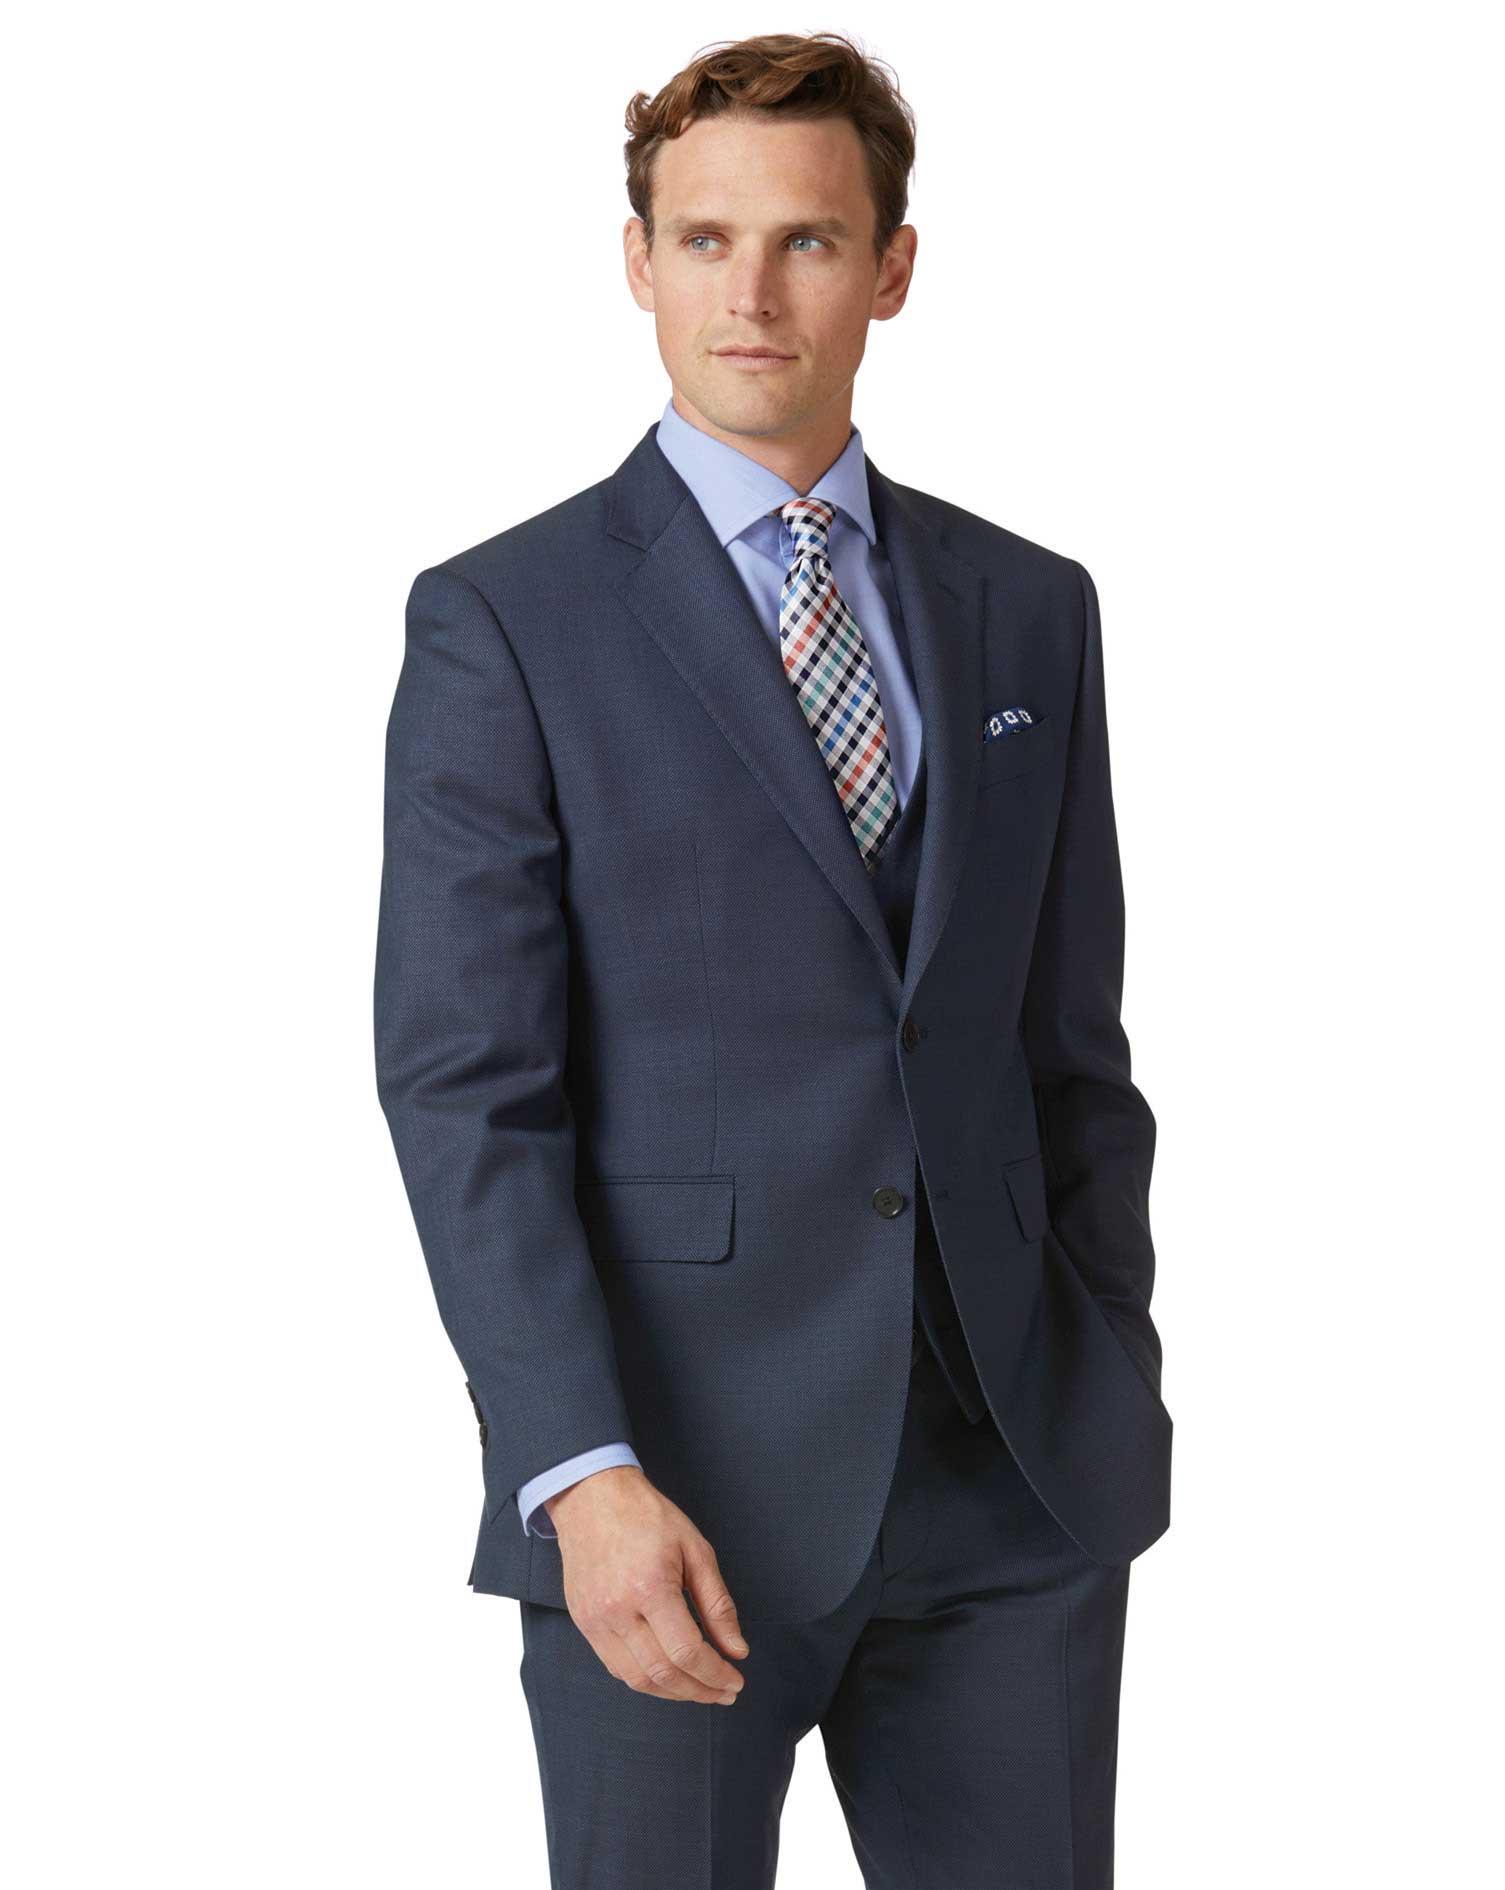 Airforce Blue Slim Fit Birdseye Travel Suit Wool Jacket Size 40 Long by Charles Tyrwhitt